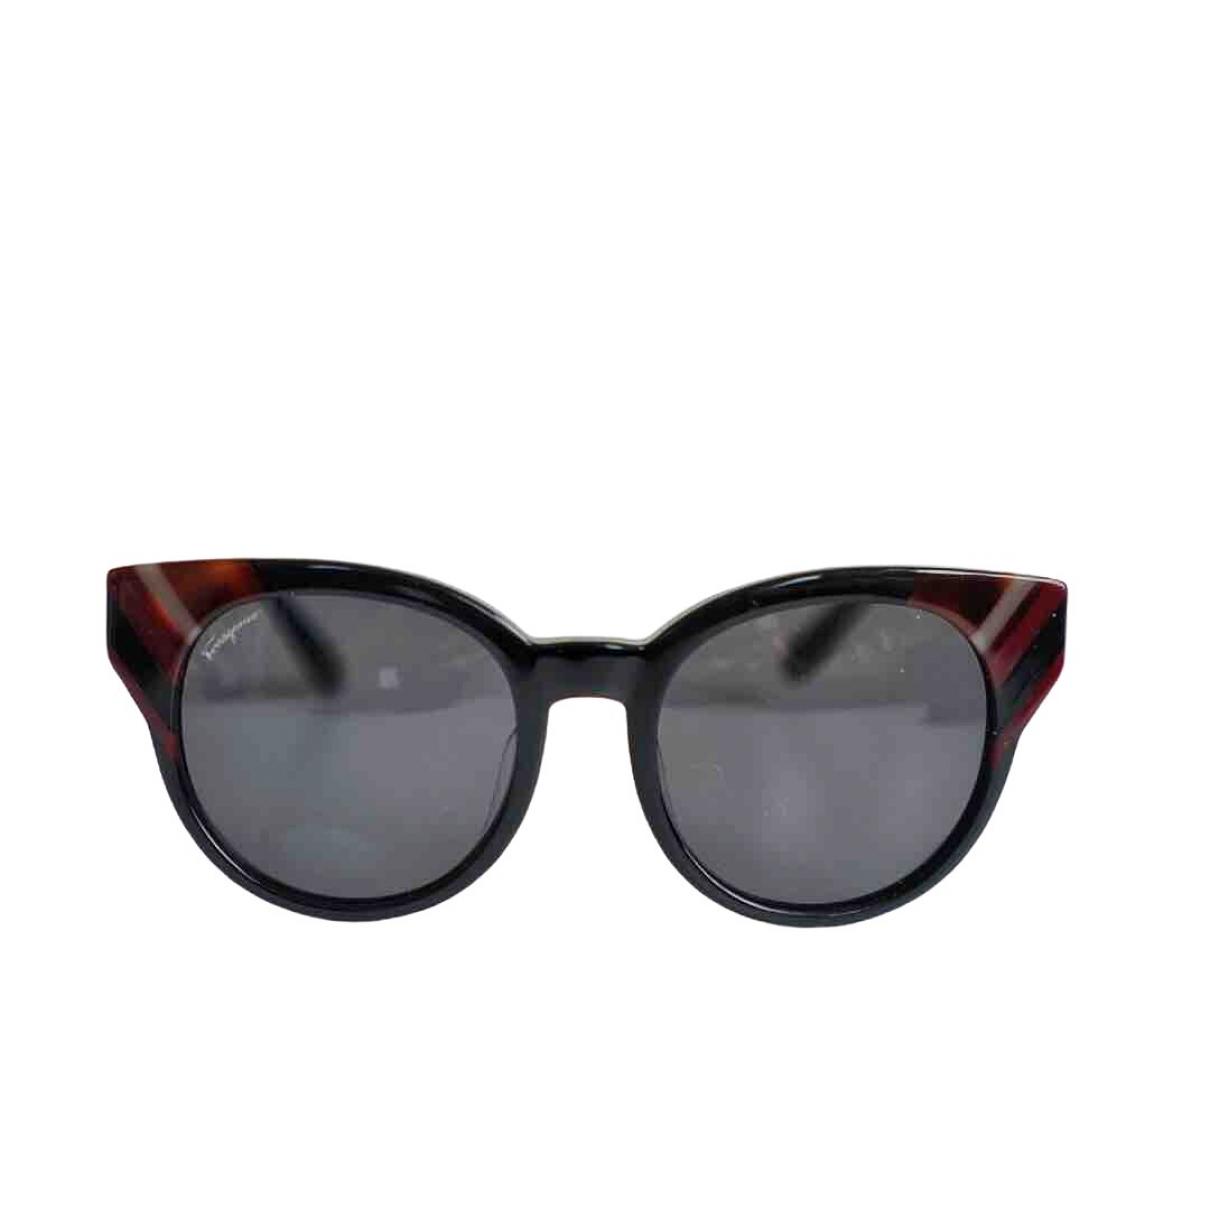 Salvatore Ferragamo \N Black Sunglasses for Women XXS International